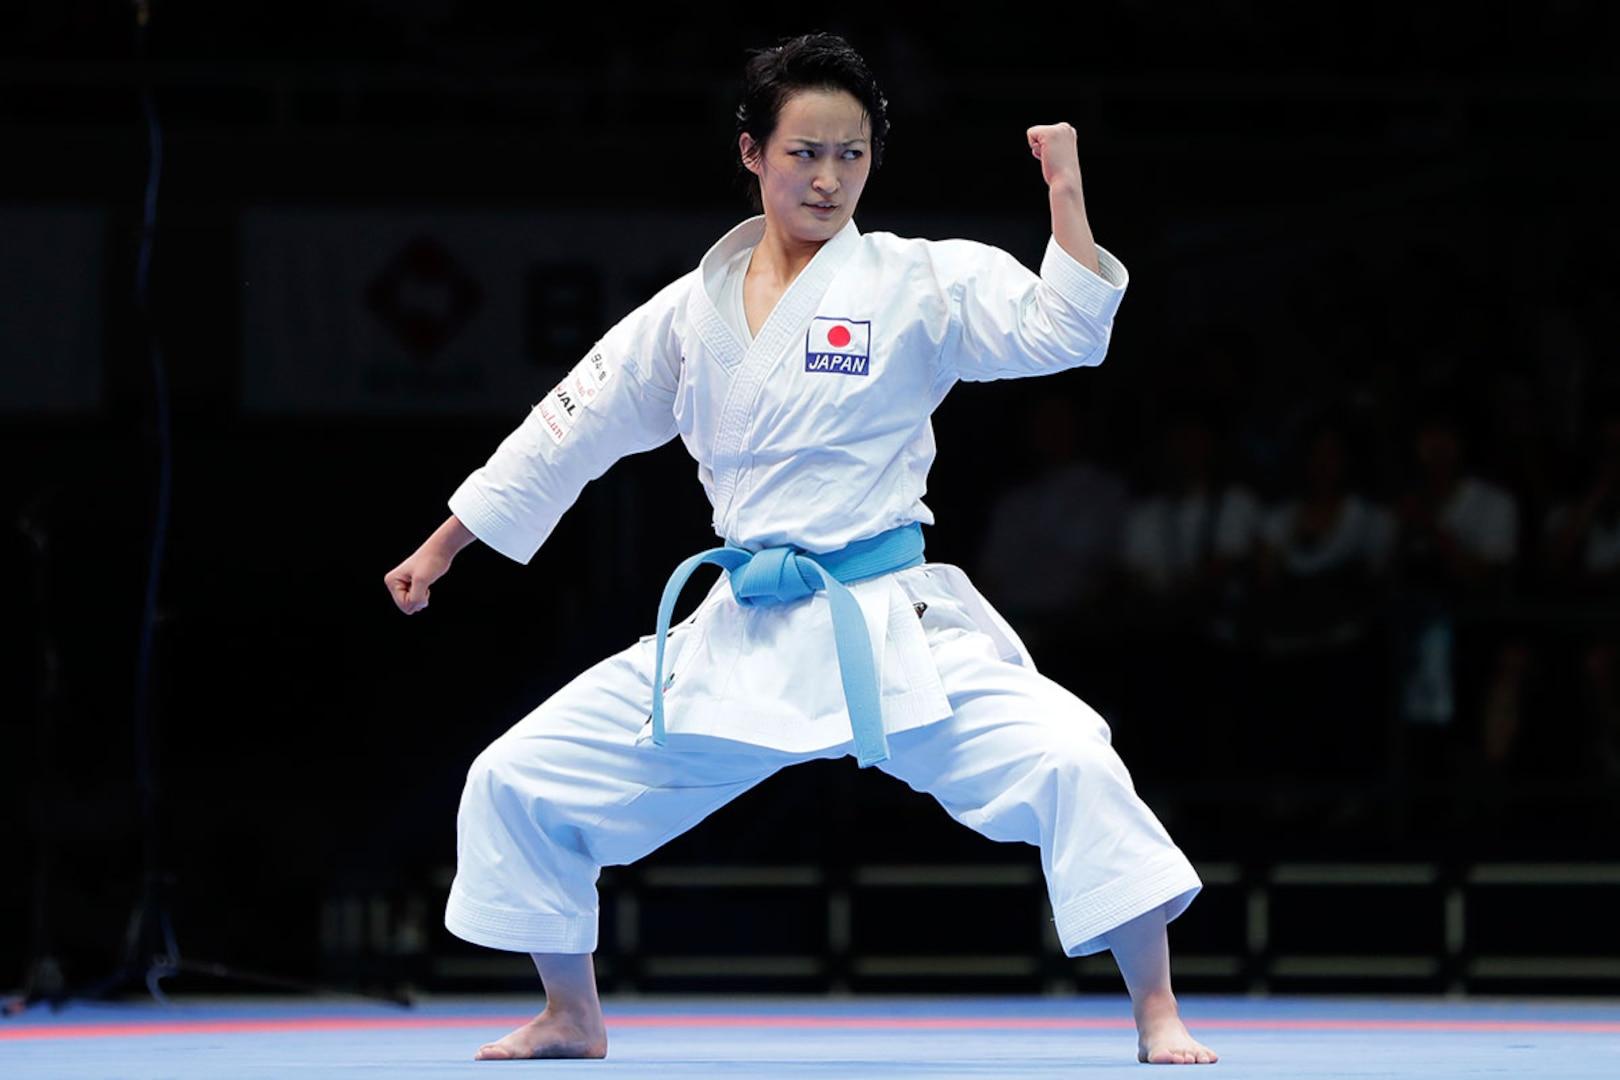 Kiyou Shimizu performs a movement during a kata competition